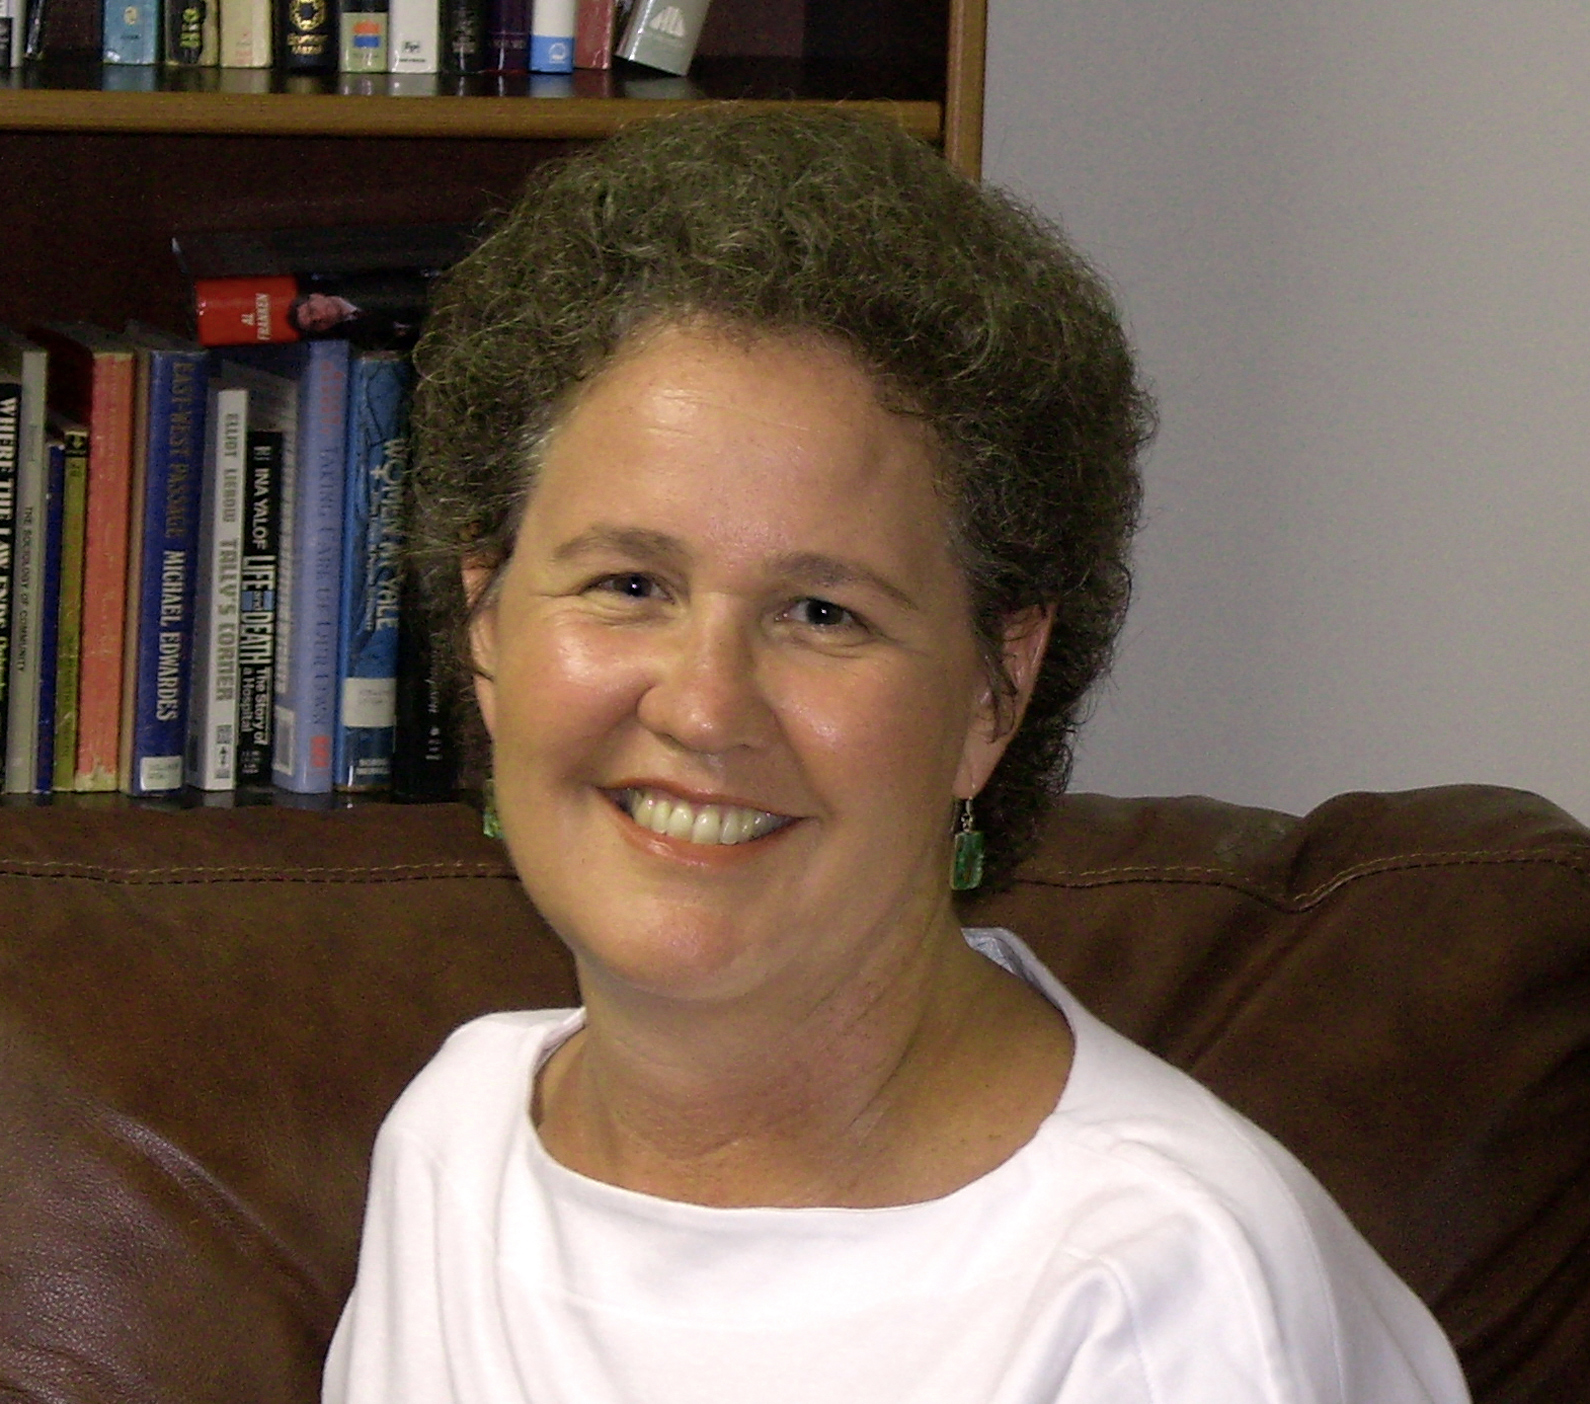 Professor Linda Darling-Hammond